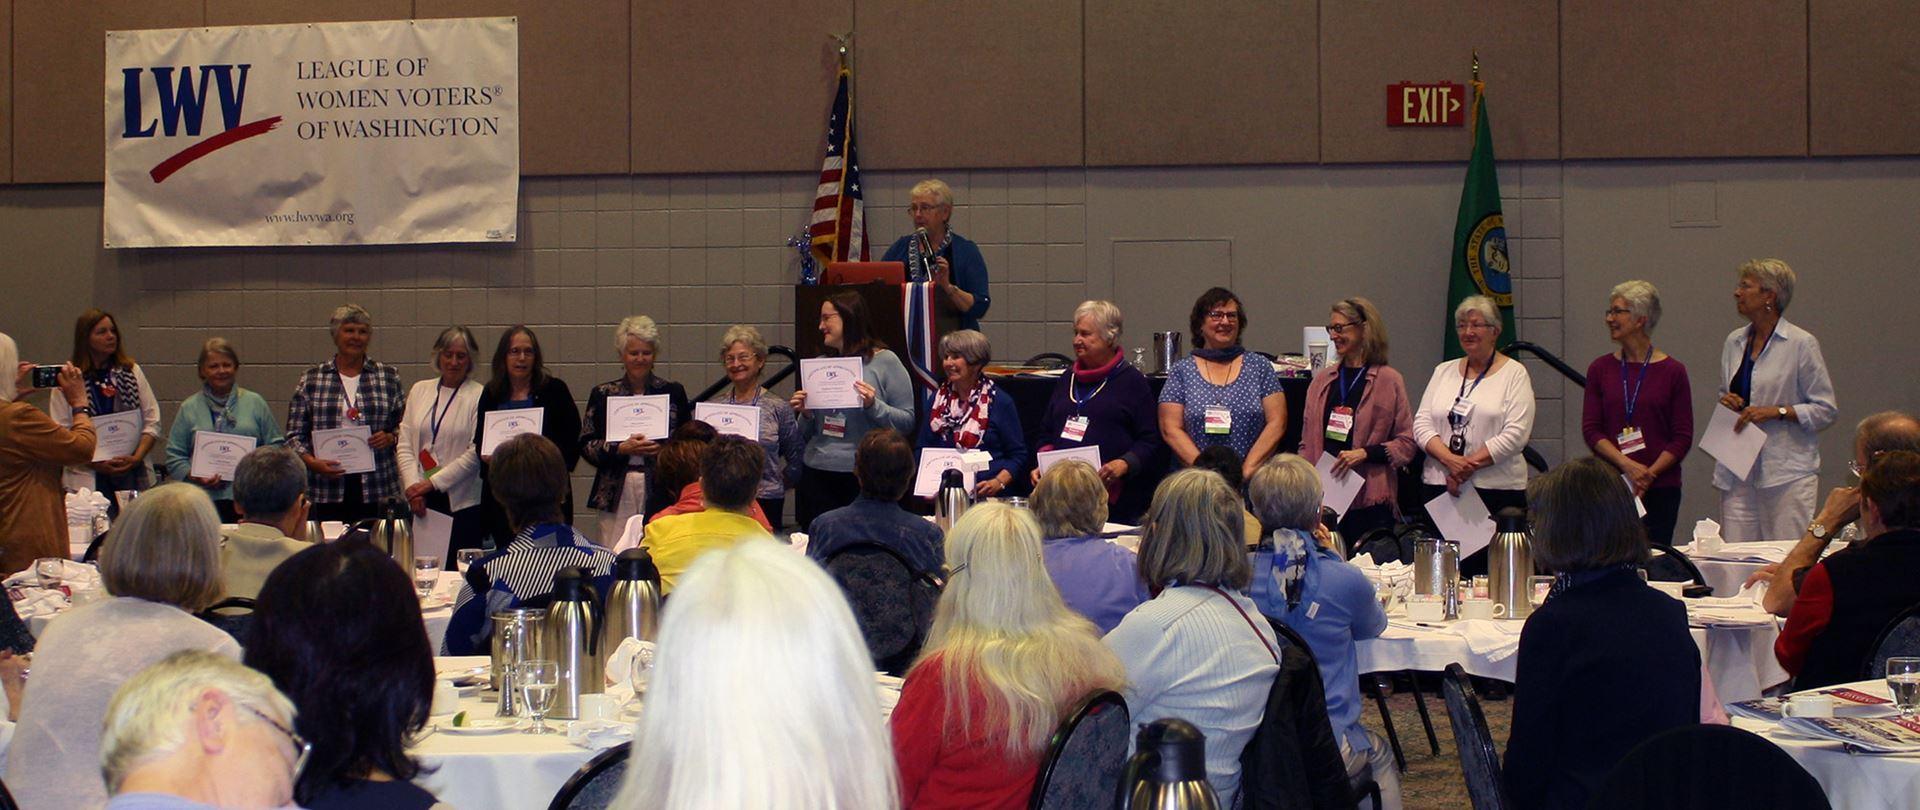 League of Women Voters of Washington - Home